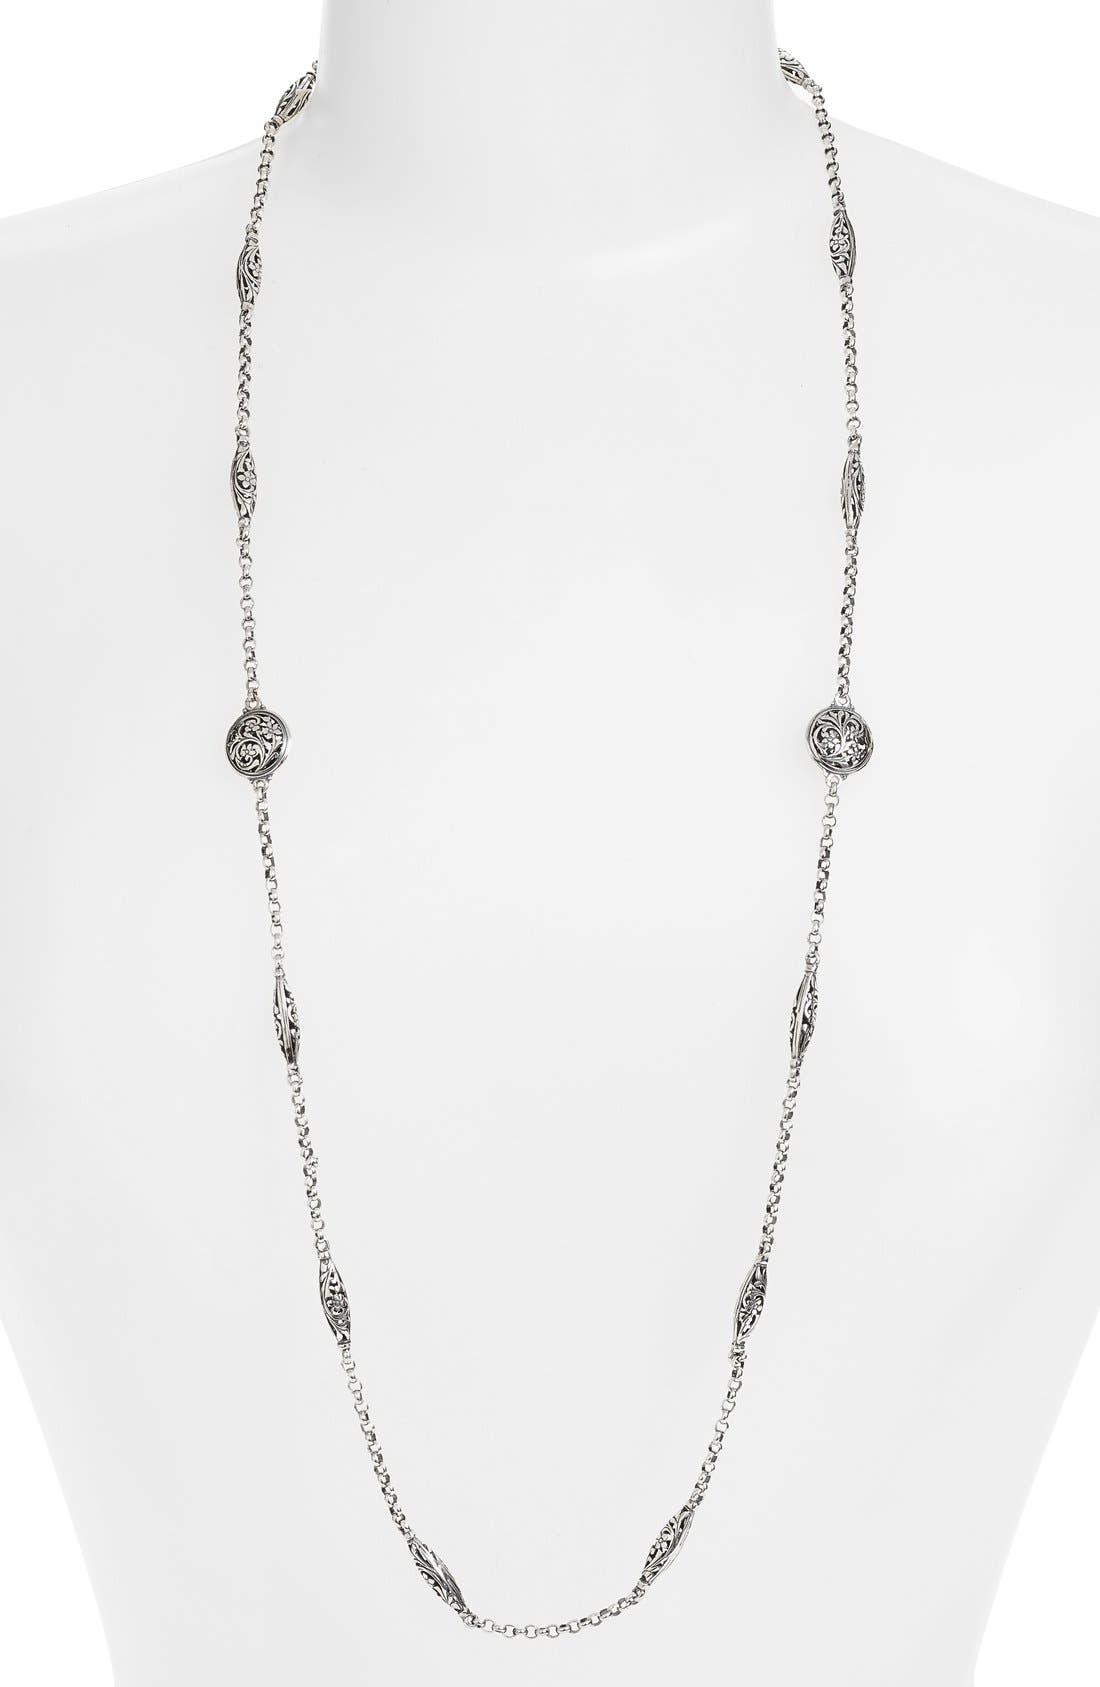 Main Image - Konstantino 'Silver Classics' Long Filigree Station Necklace